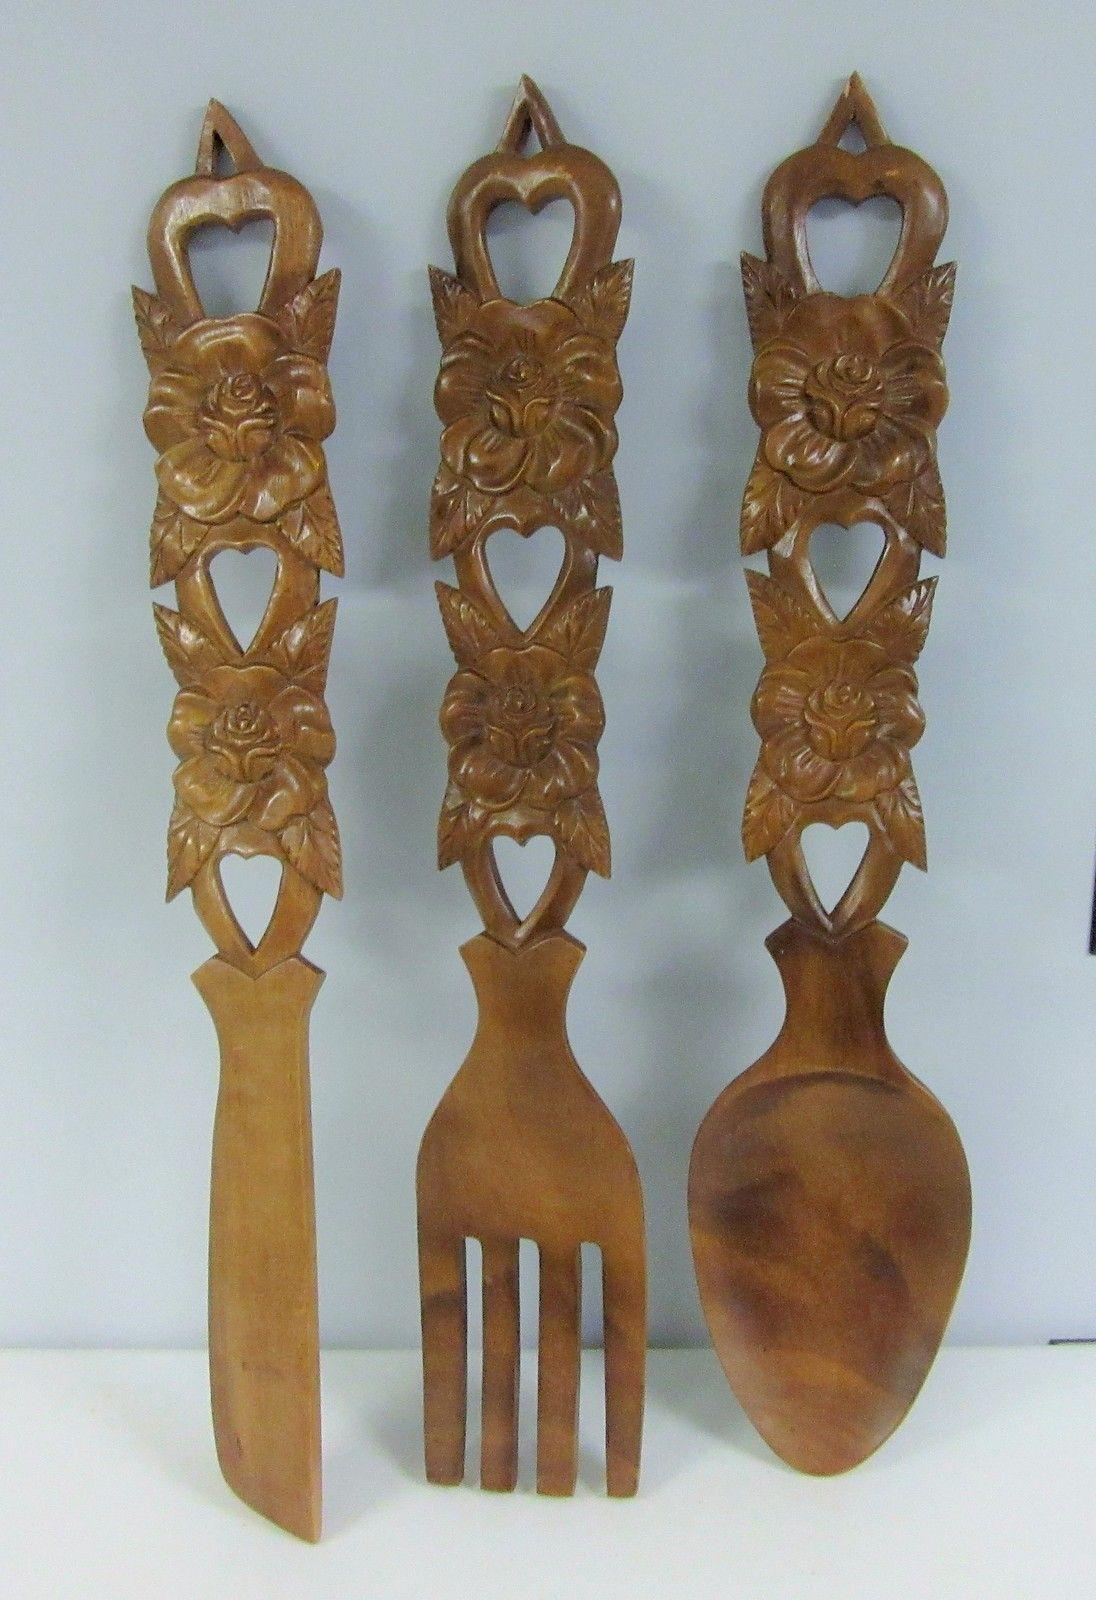 Vintage Wooden Spoon Fork Knife Wall Decor Large 32 12 Carved